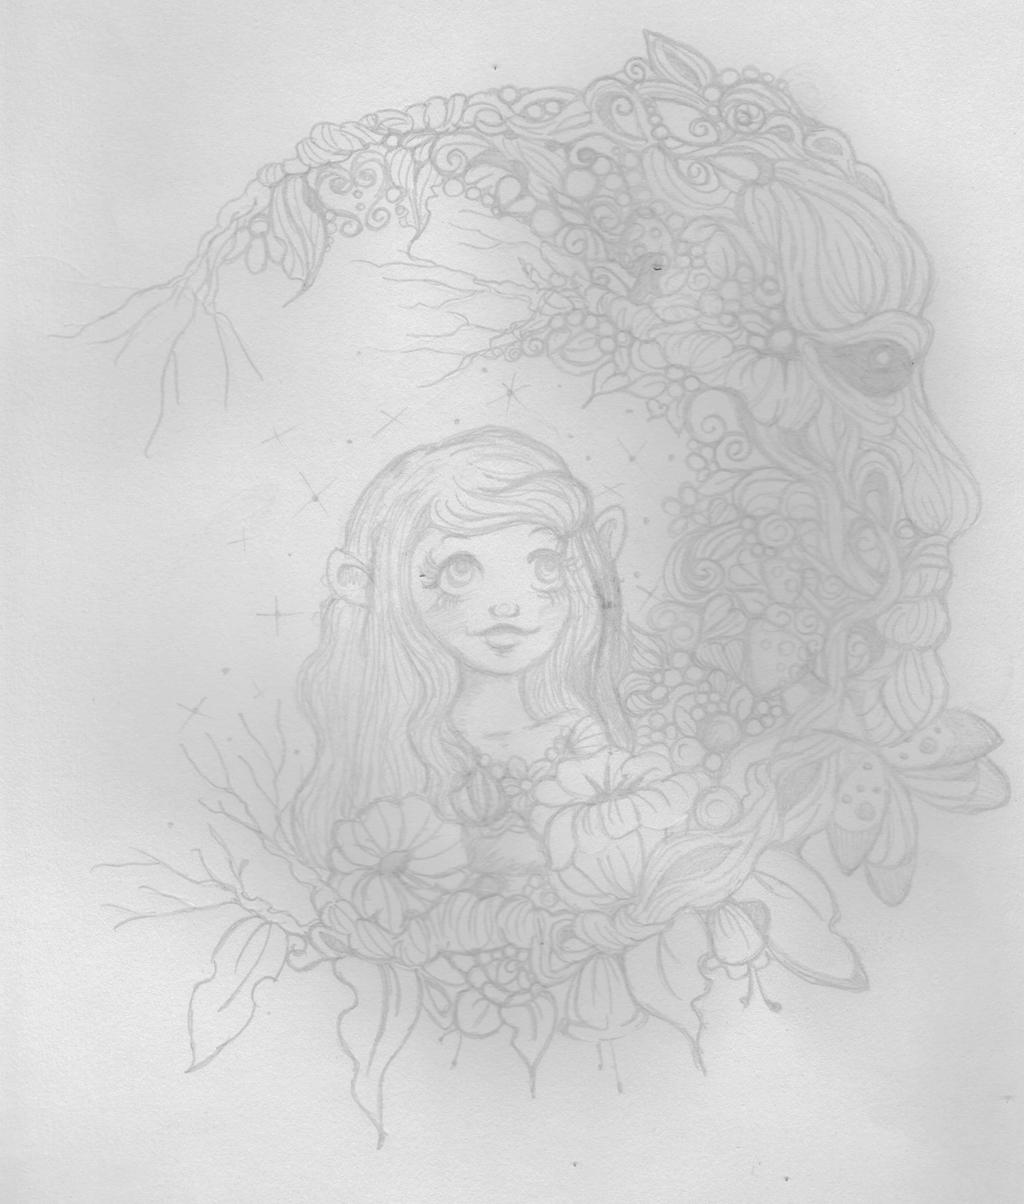 Woodman Moon by Heartsdesire-fantasy